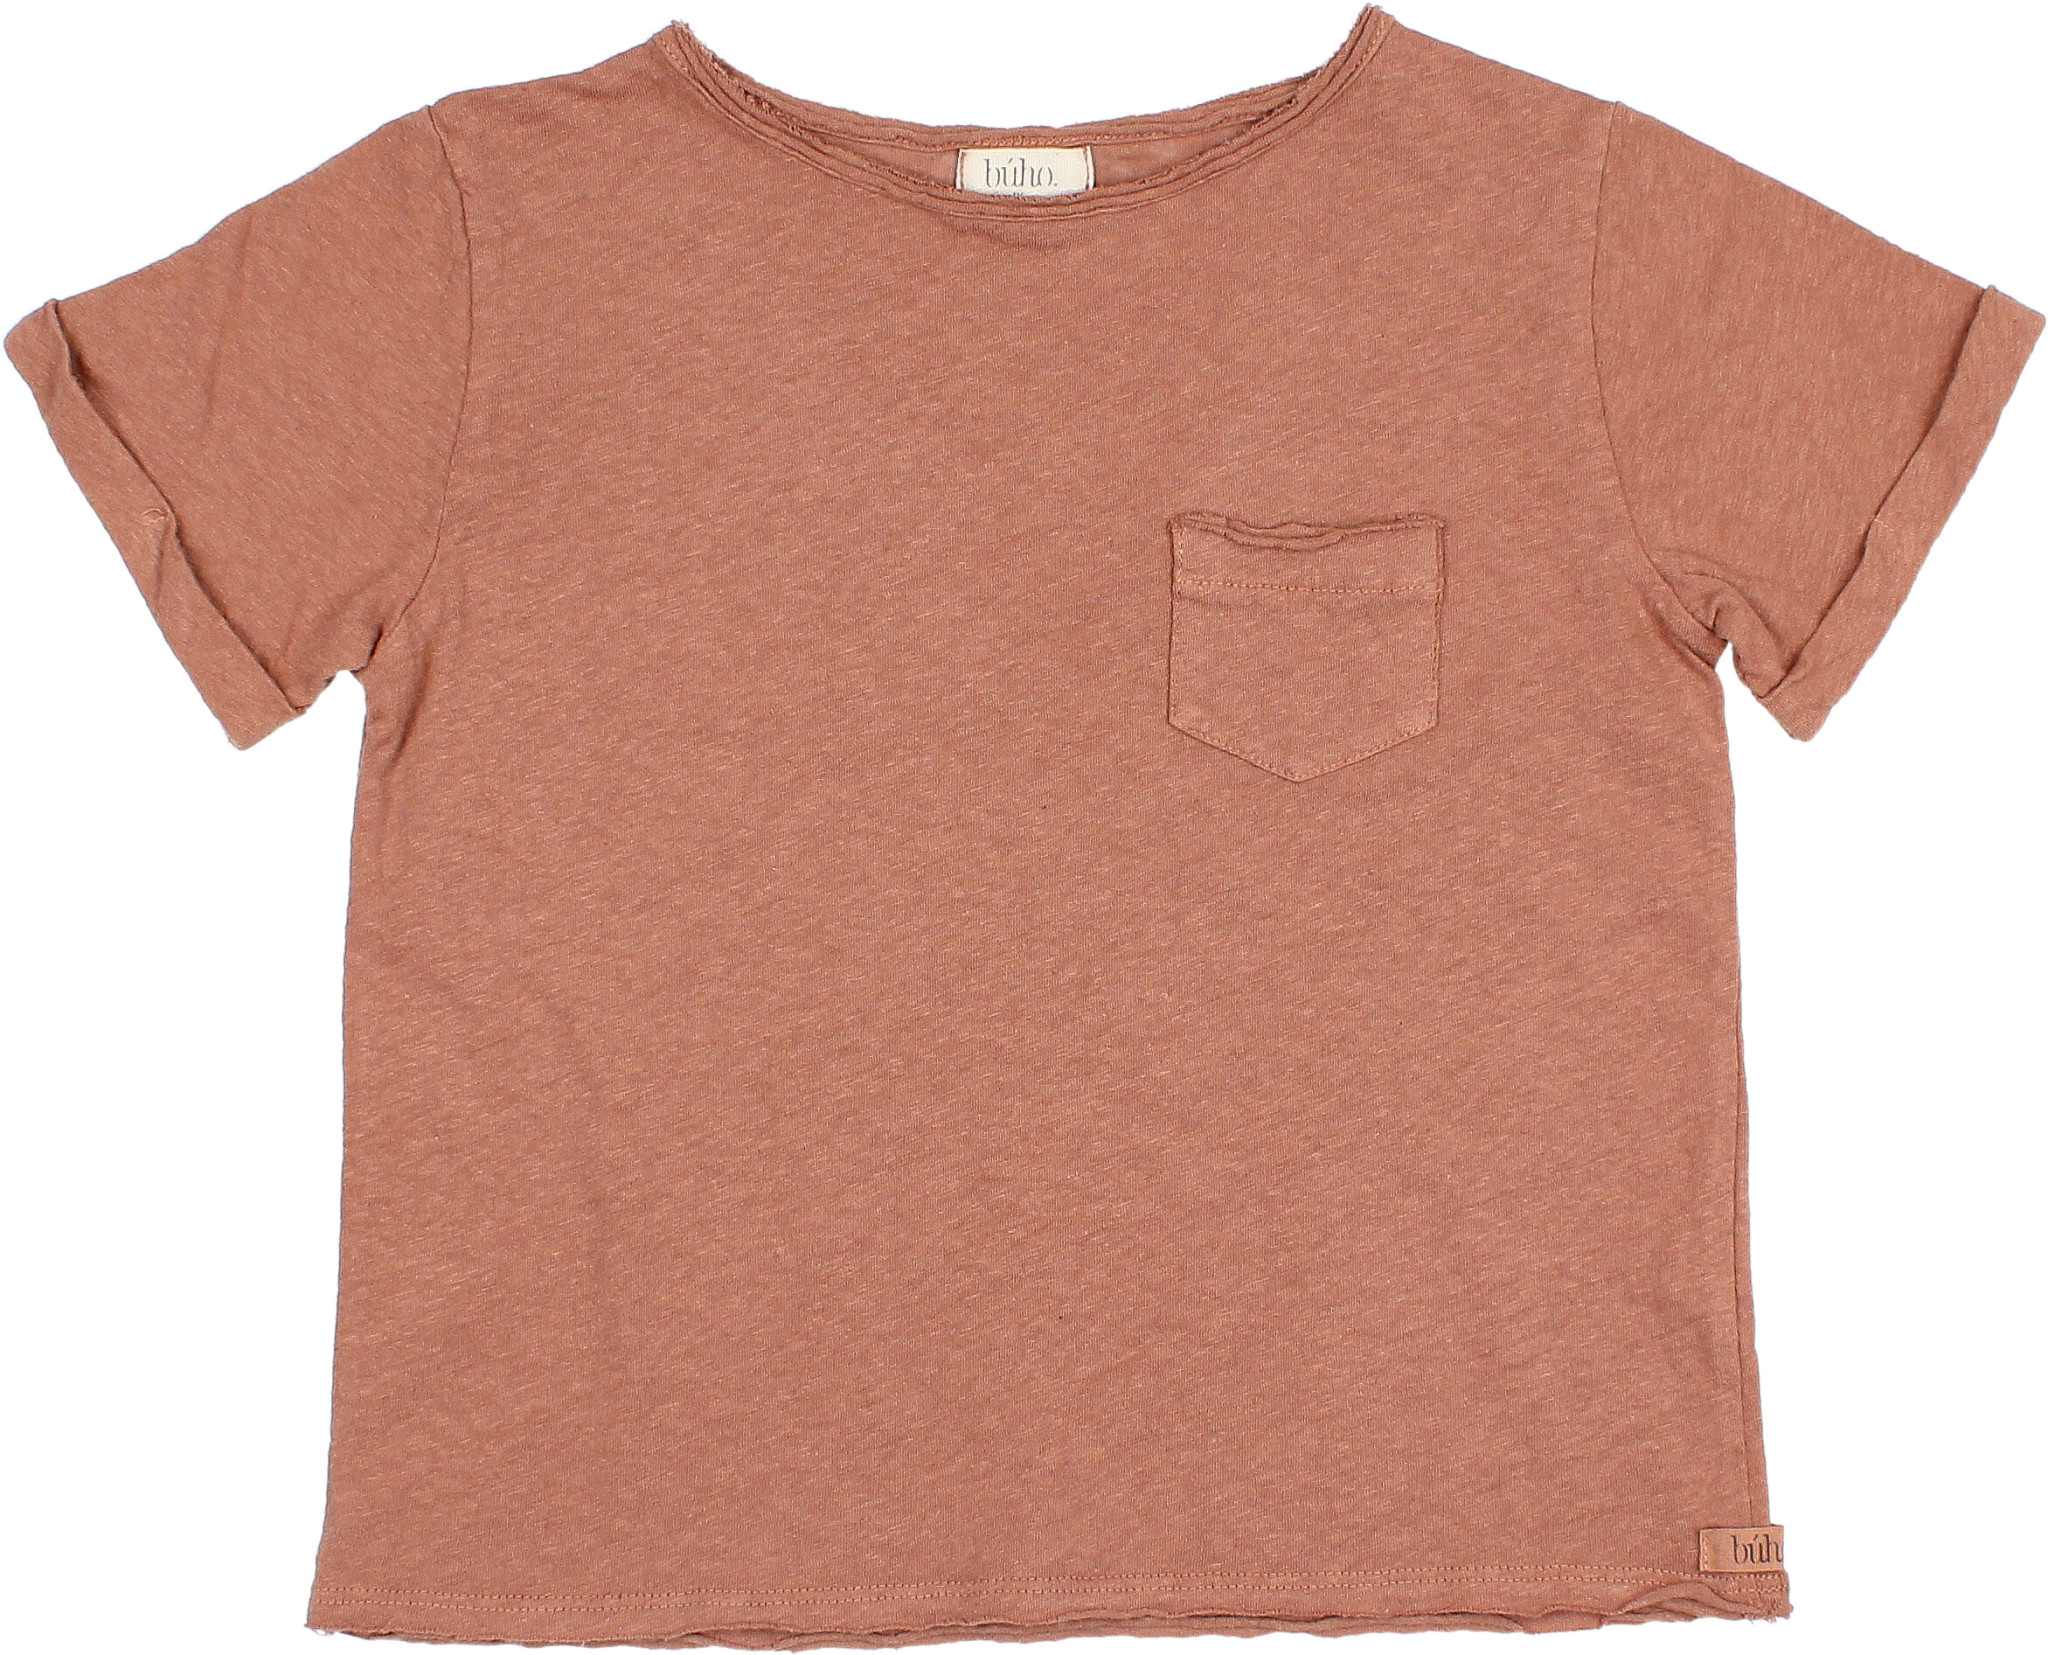 James t-shirt cocoa-1